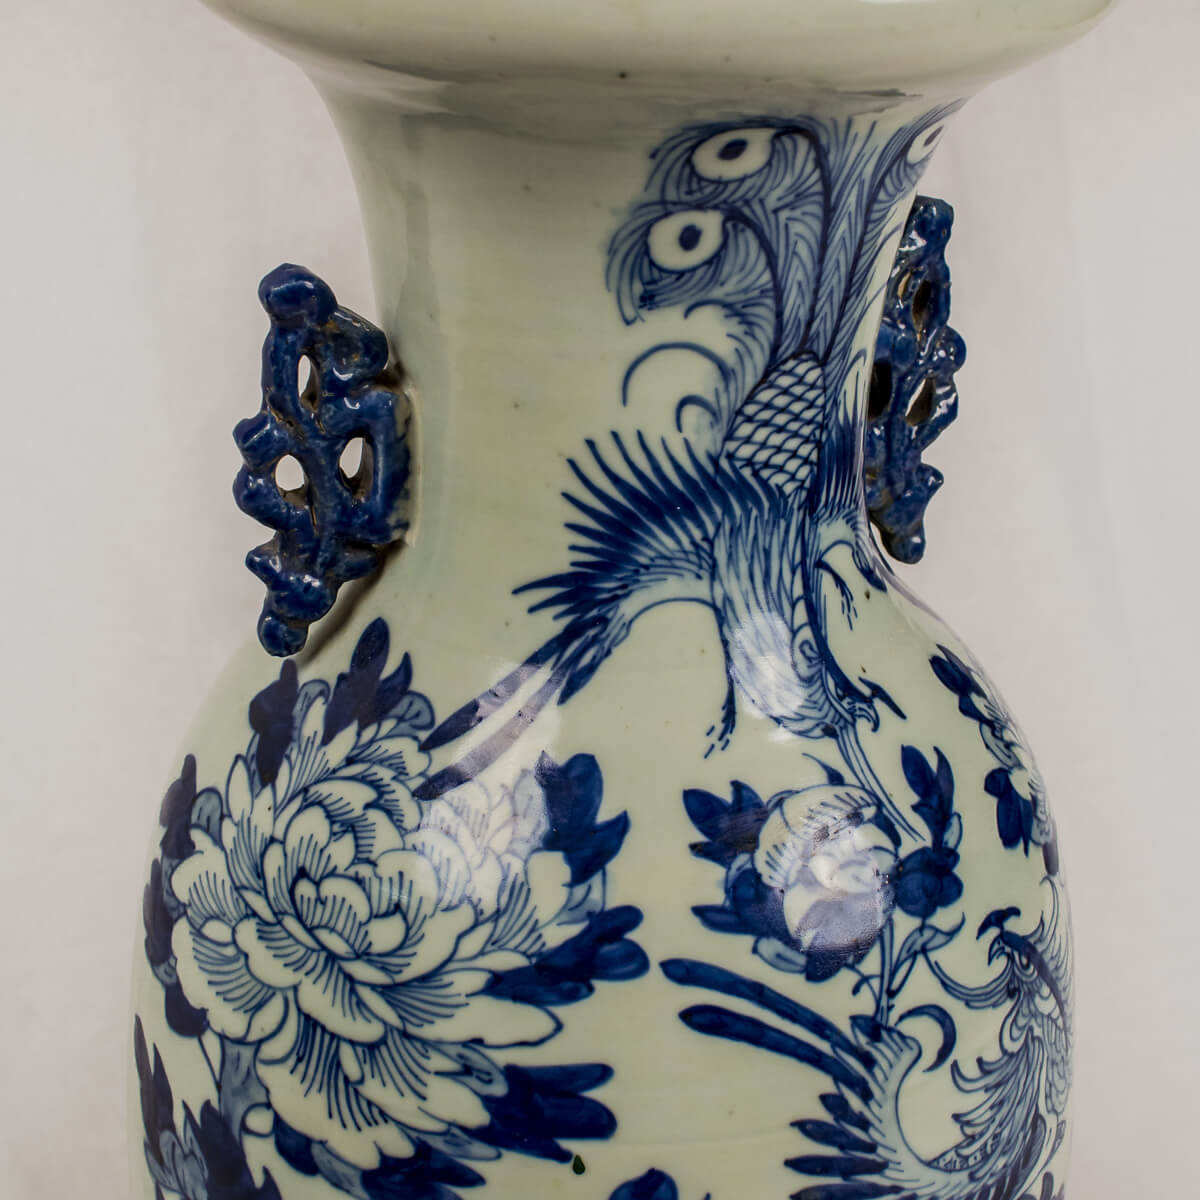 Vaso bianco blu con fenice